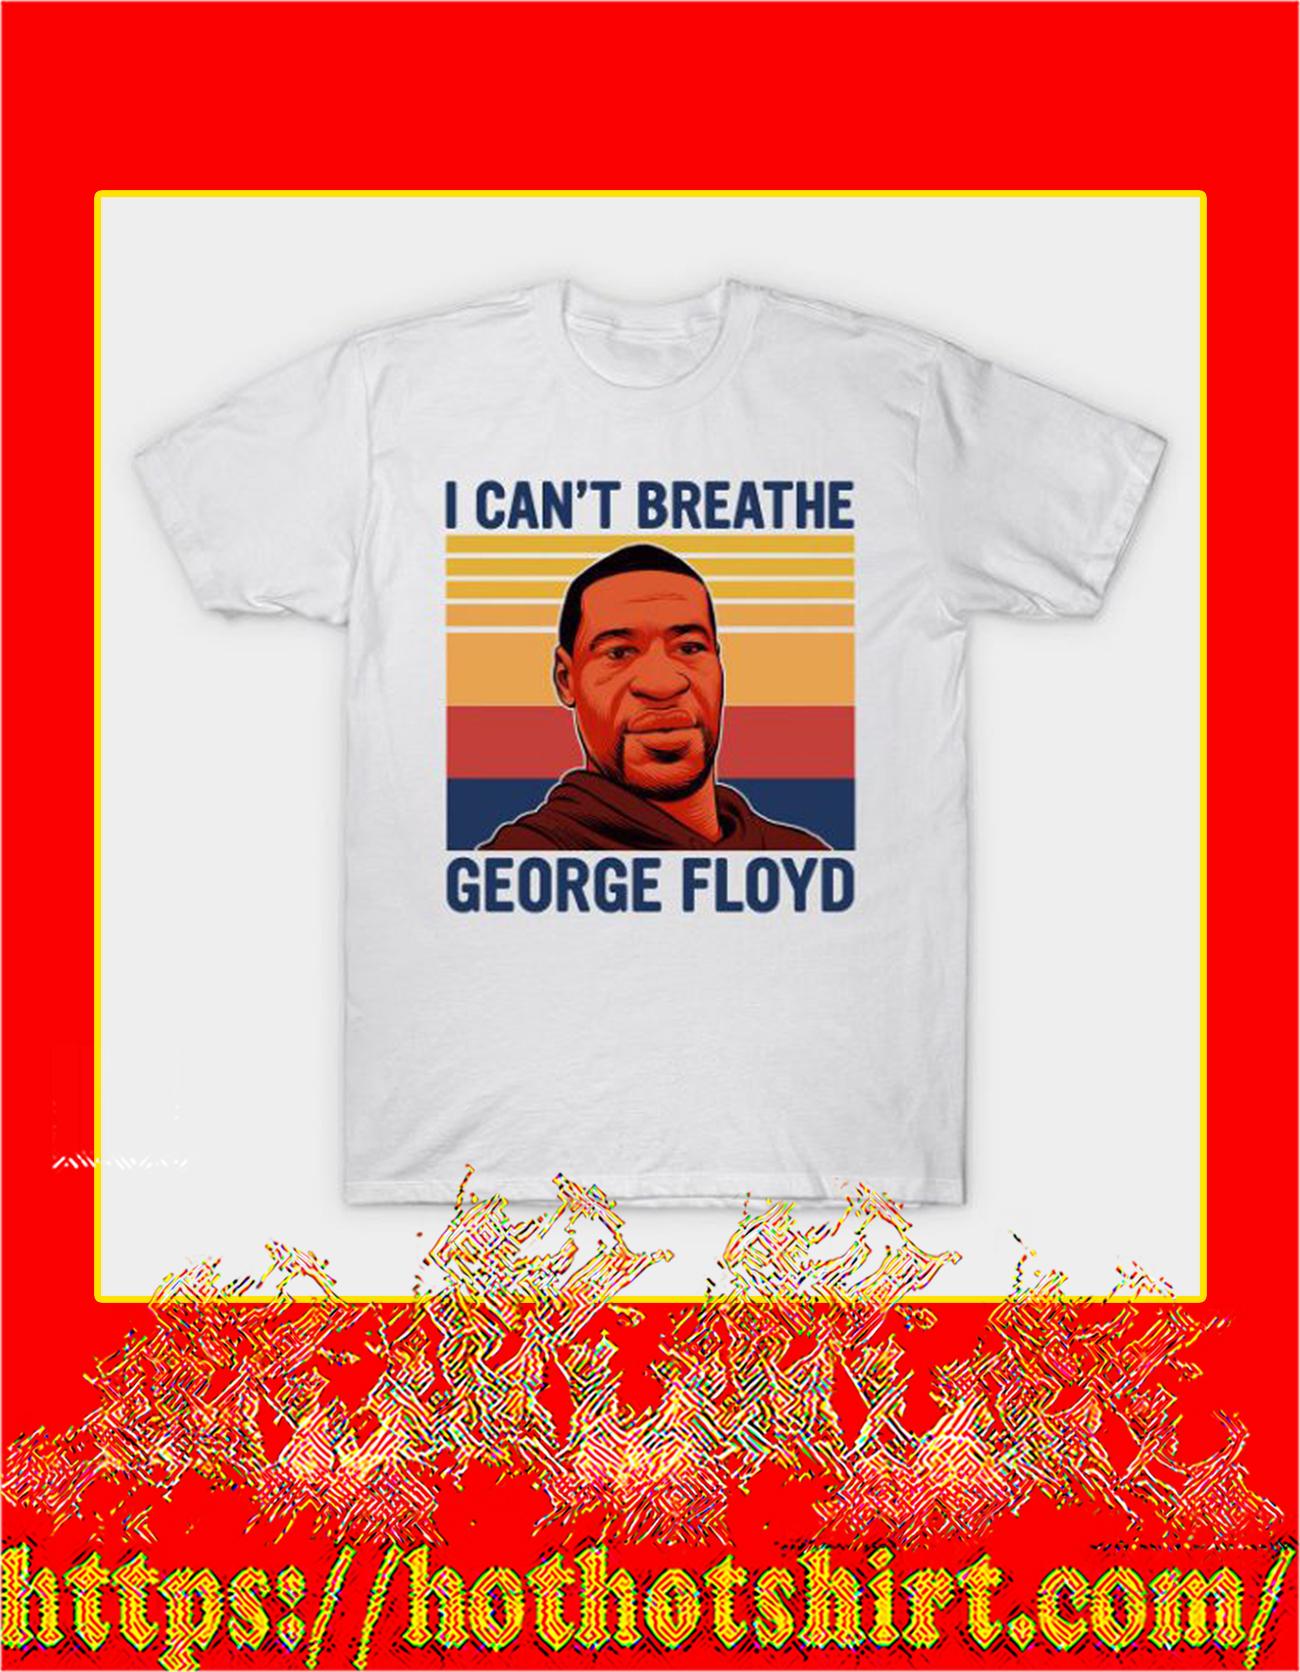 I can't breathe george floyd shirt - detail